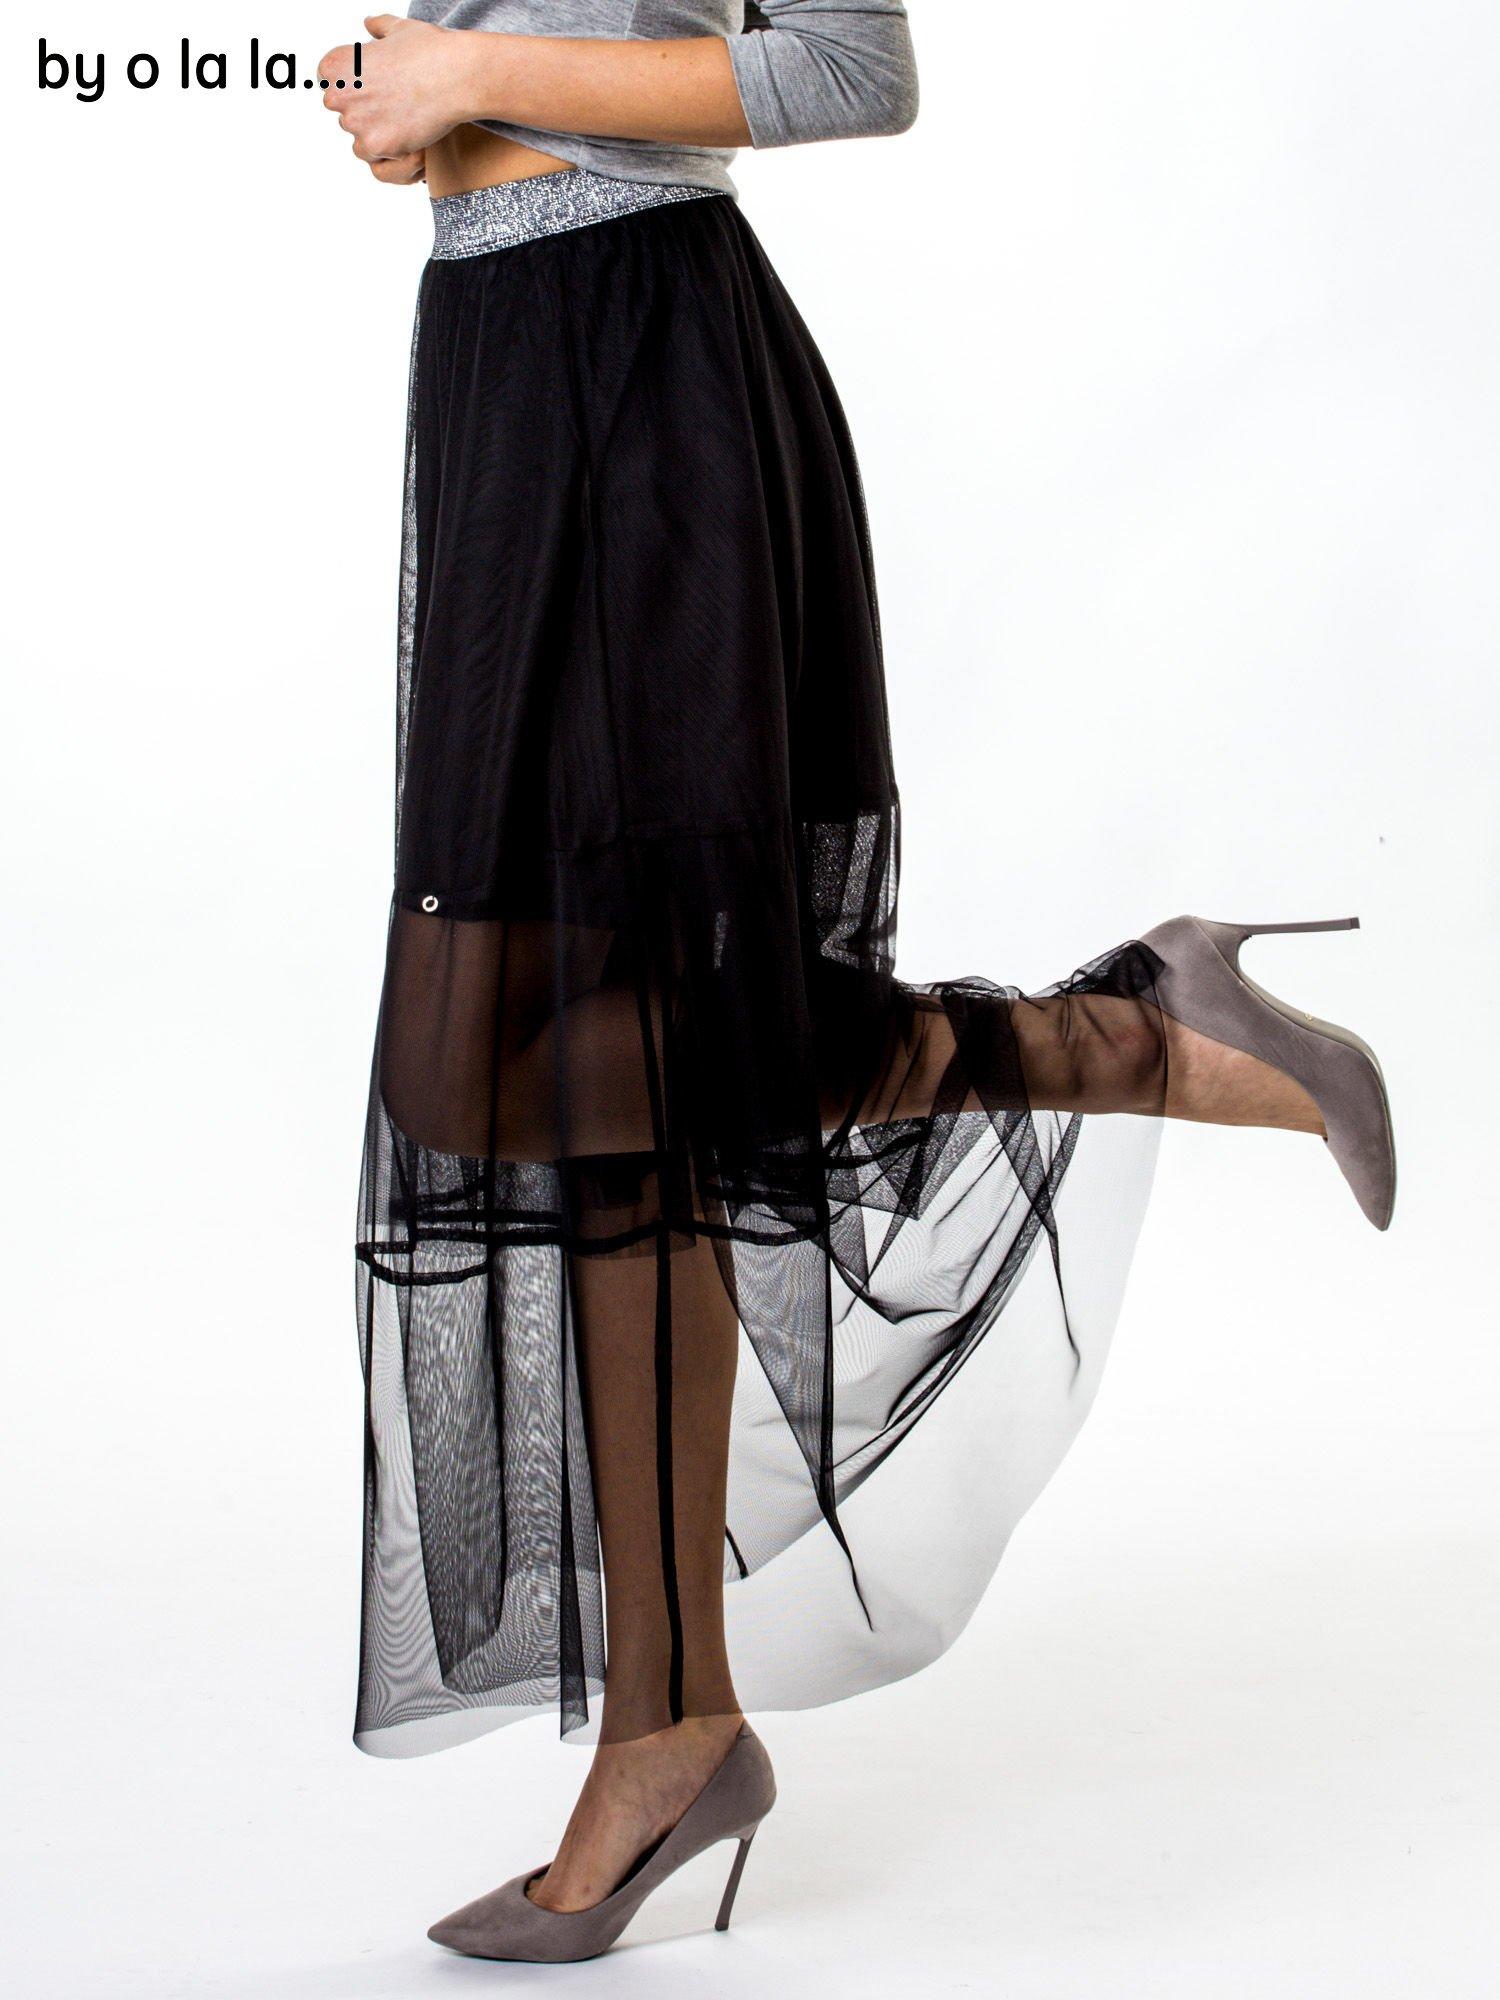 a8e39a79 Czarna tiulowa spódnica ze srebrnym paskiem BY O LA LA